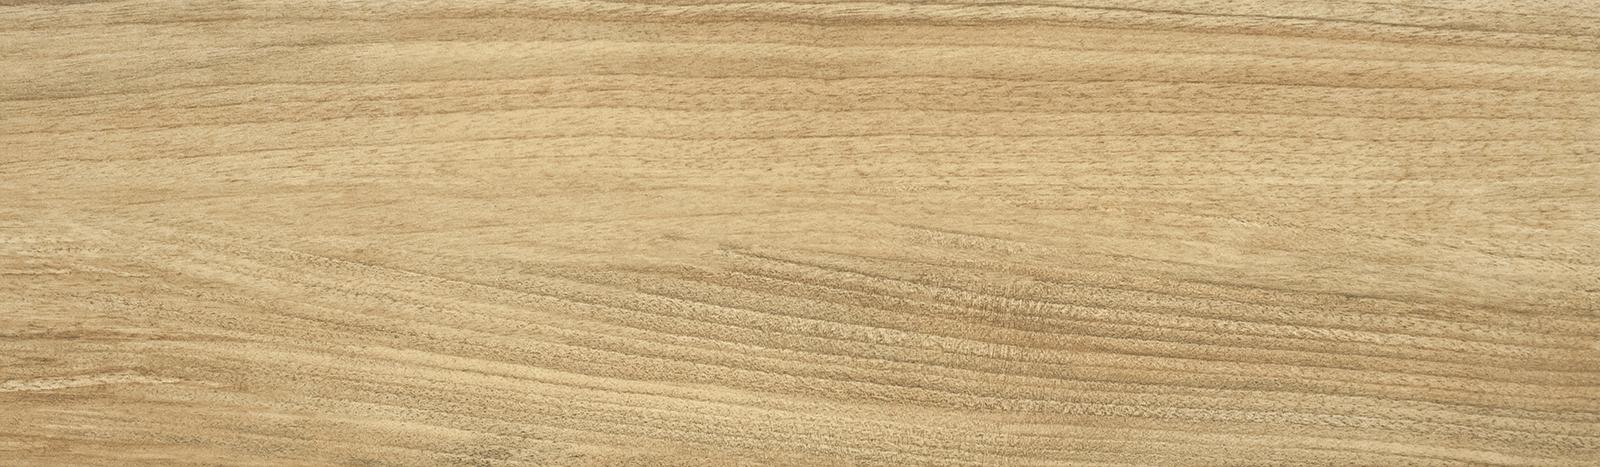 ГРАНИТОГРЕС Lussaca sabbia 17.5x60